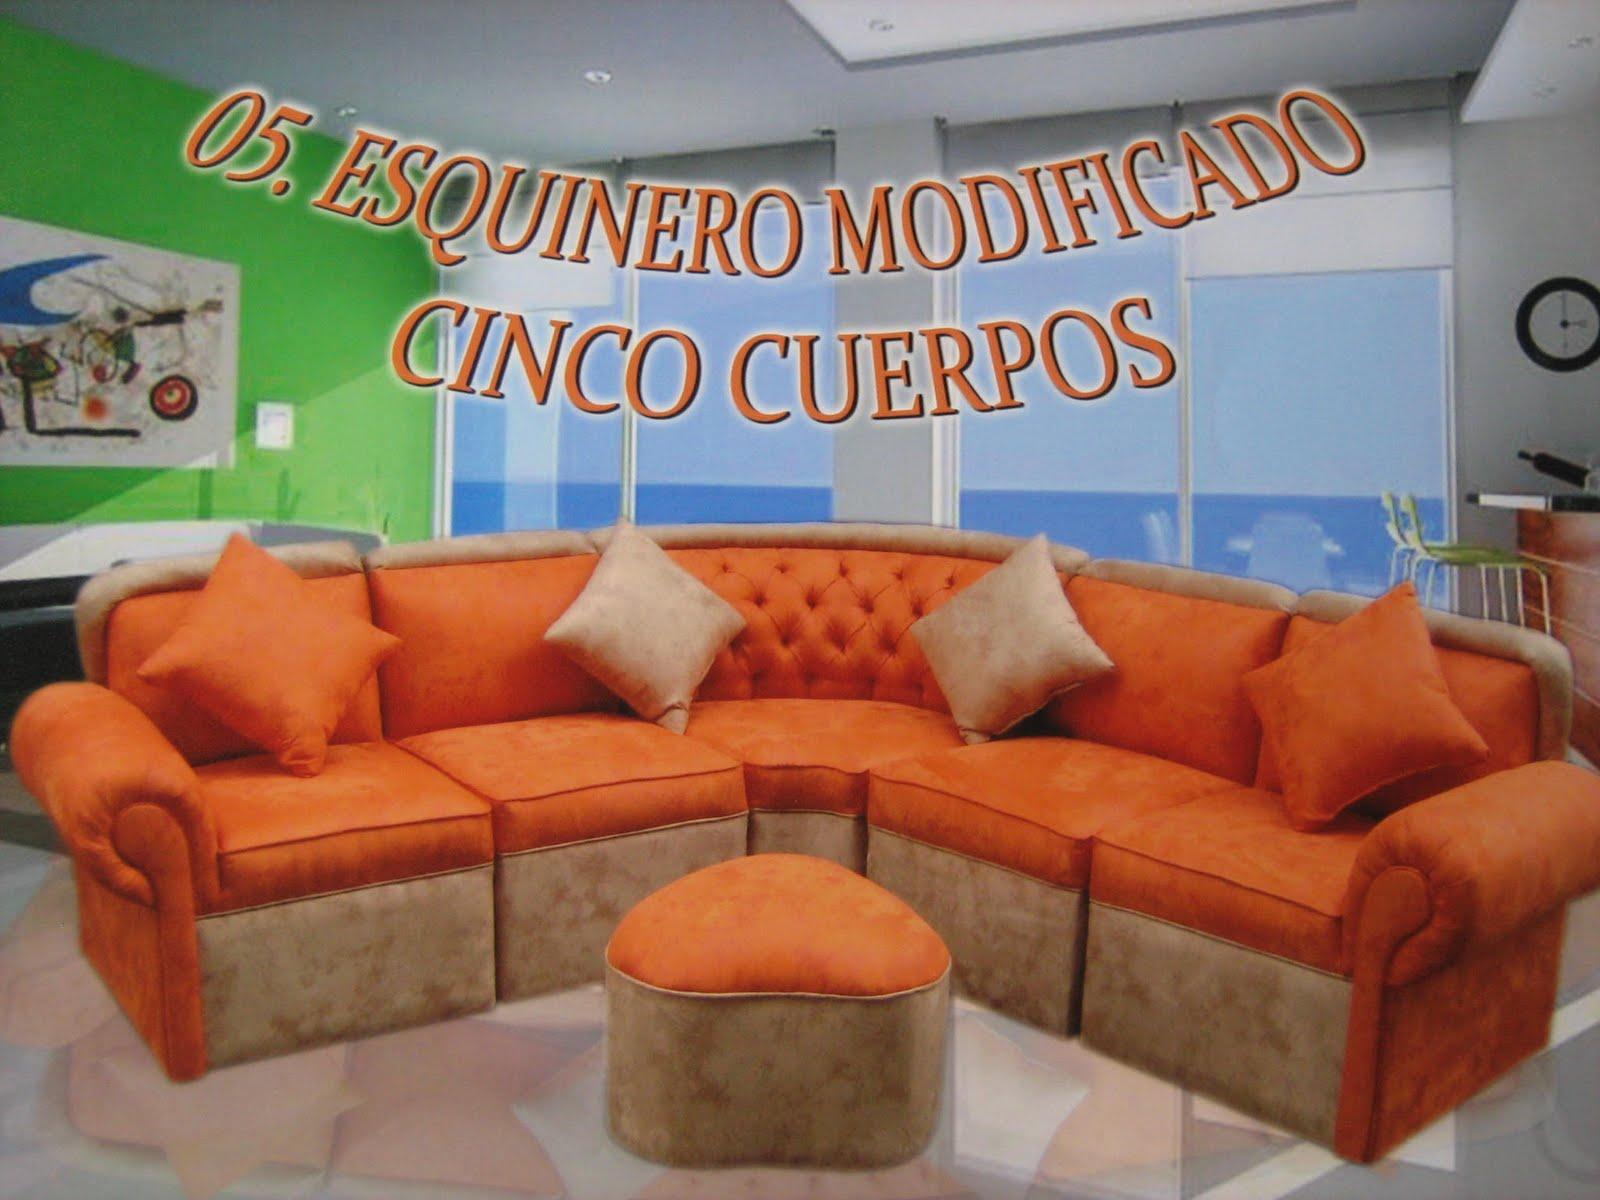 Muebles Rionegro - Muebles La Marqueza[mjhdah]https://images.locanto.com.co/1984954721/lavado-de-muebles-Rionegro_4.jpg